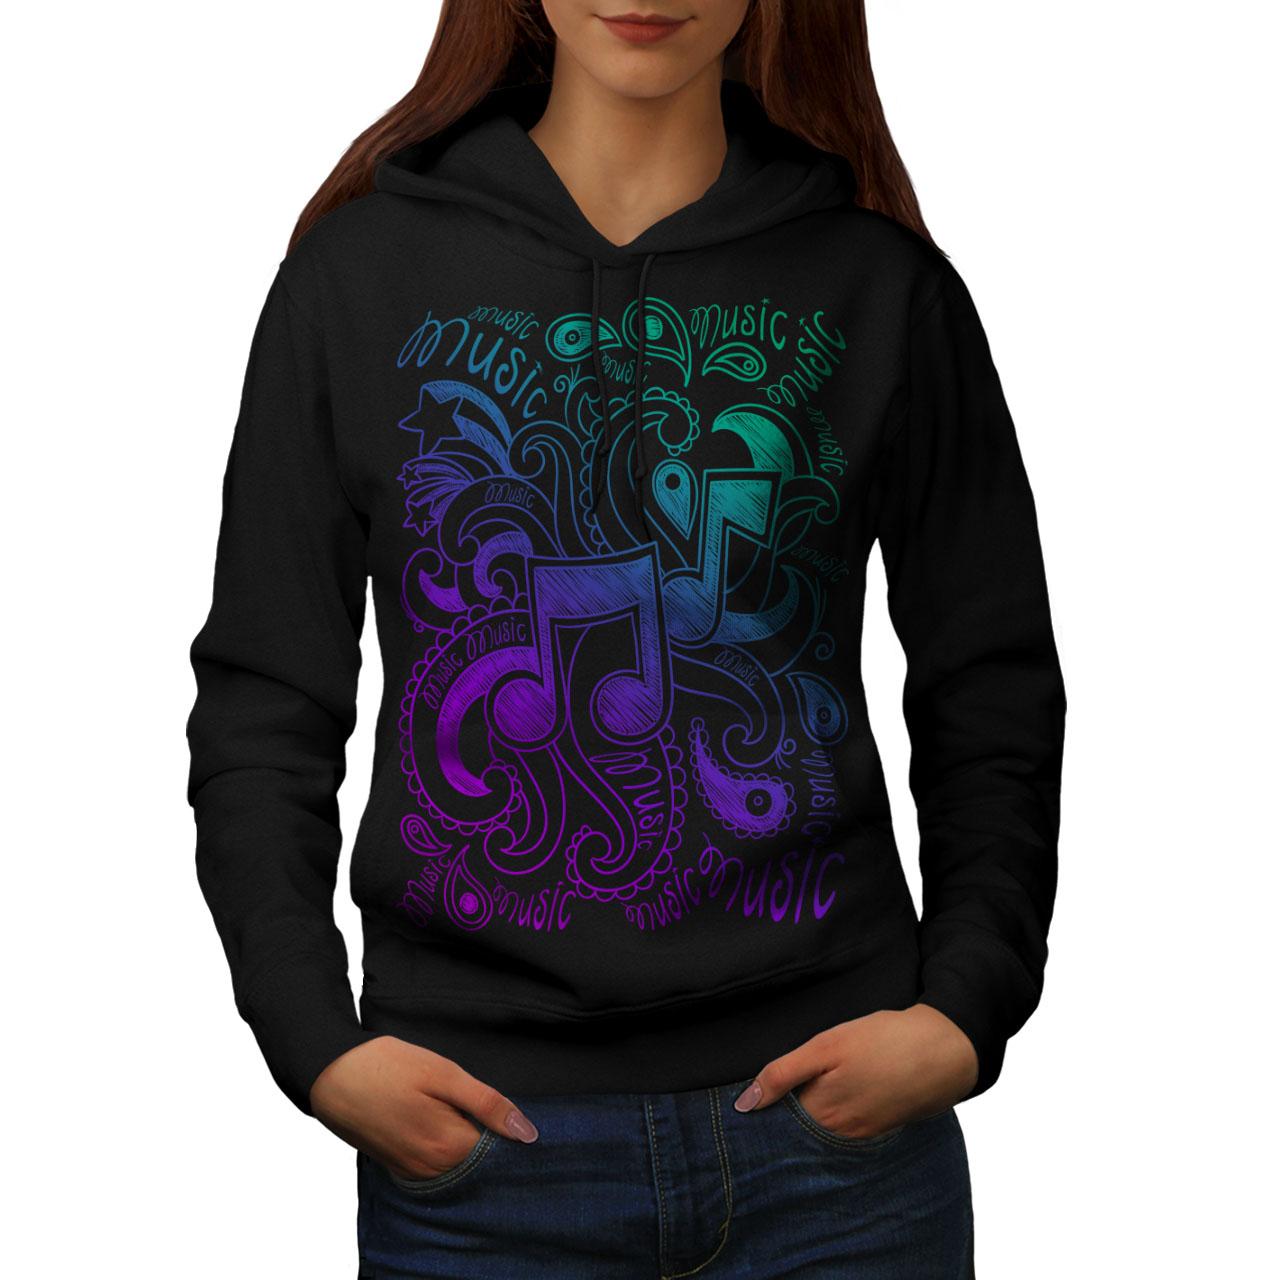 Sound Casual Hooded Sweatshirt Wellcoda Musical Ornament Womens Hoodie